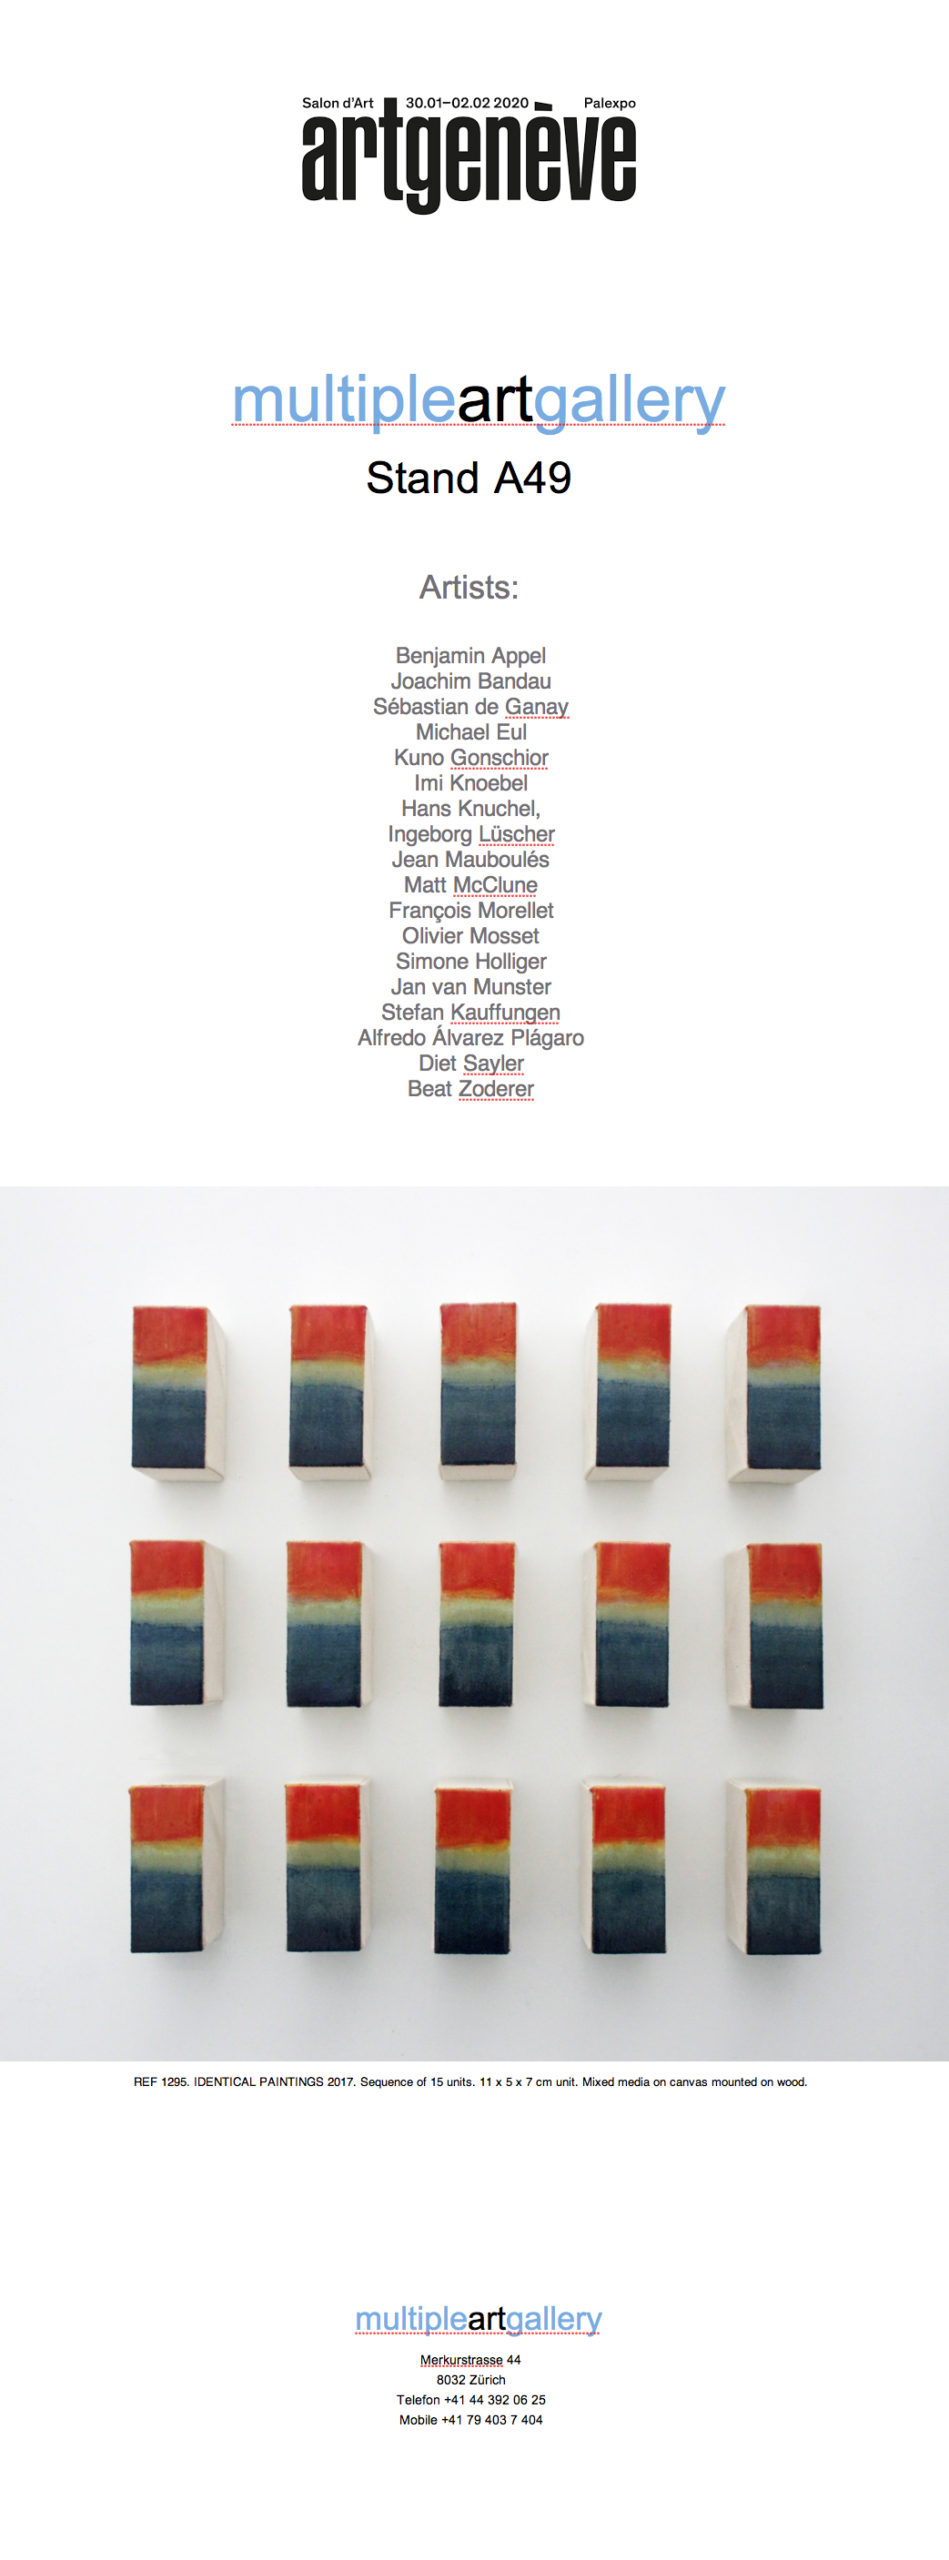 ART GENÈVE 2020